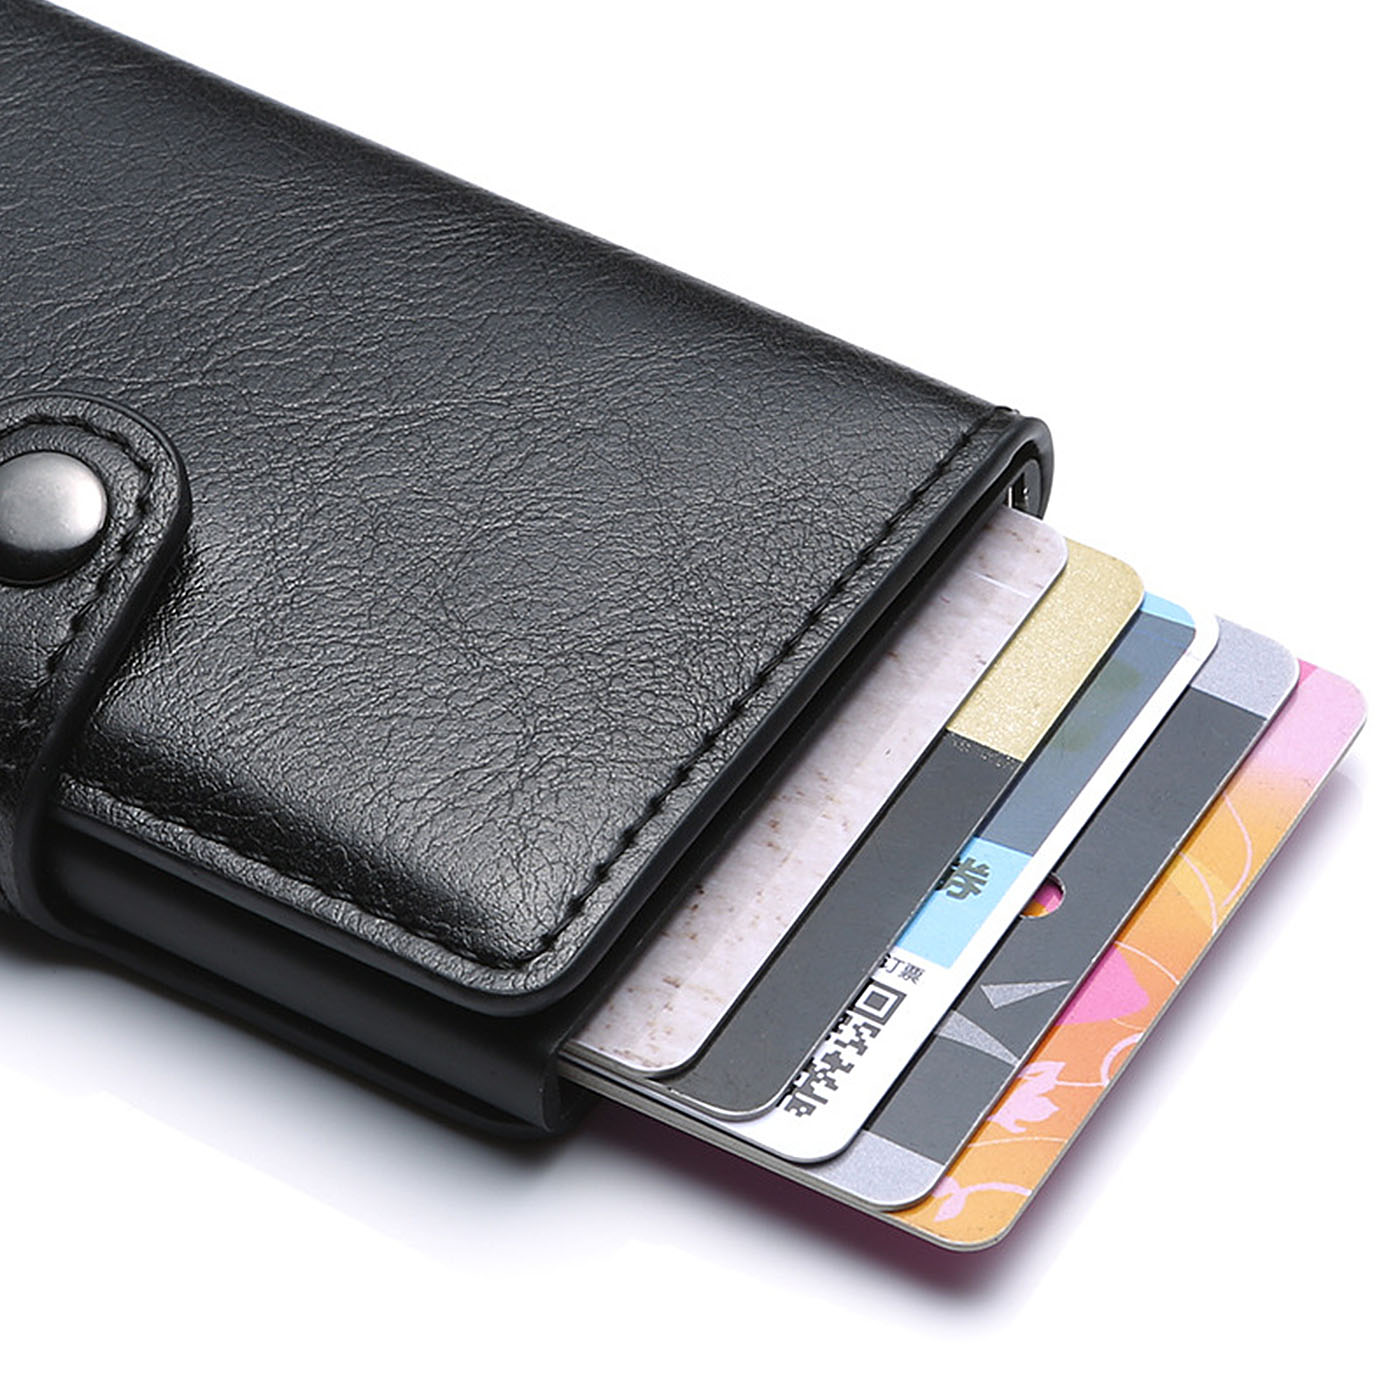 2019 Rfid Card Holder Men Wallets RFID Money Bag Male Vintage Black Short Purse Small Leather Slim Wallets Mini Wallets Thin